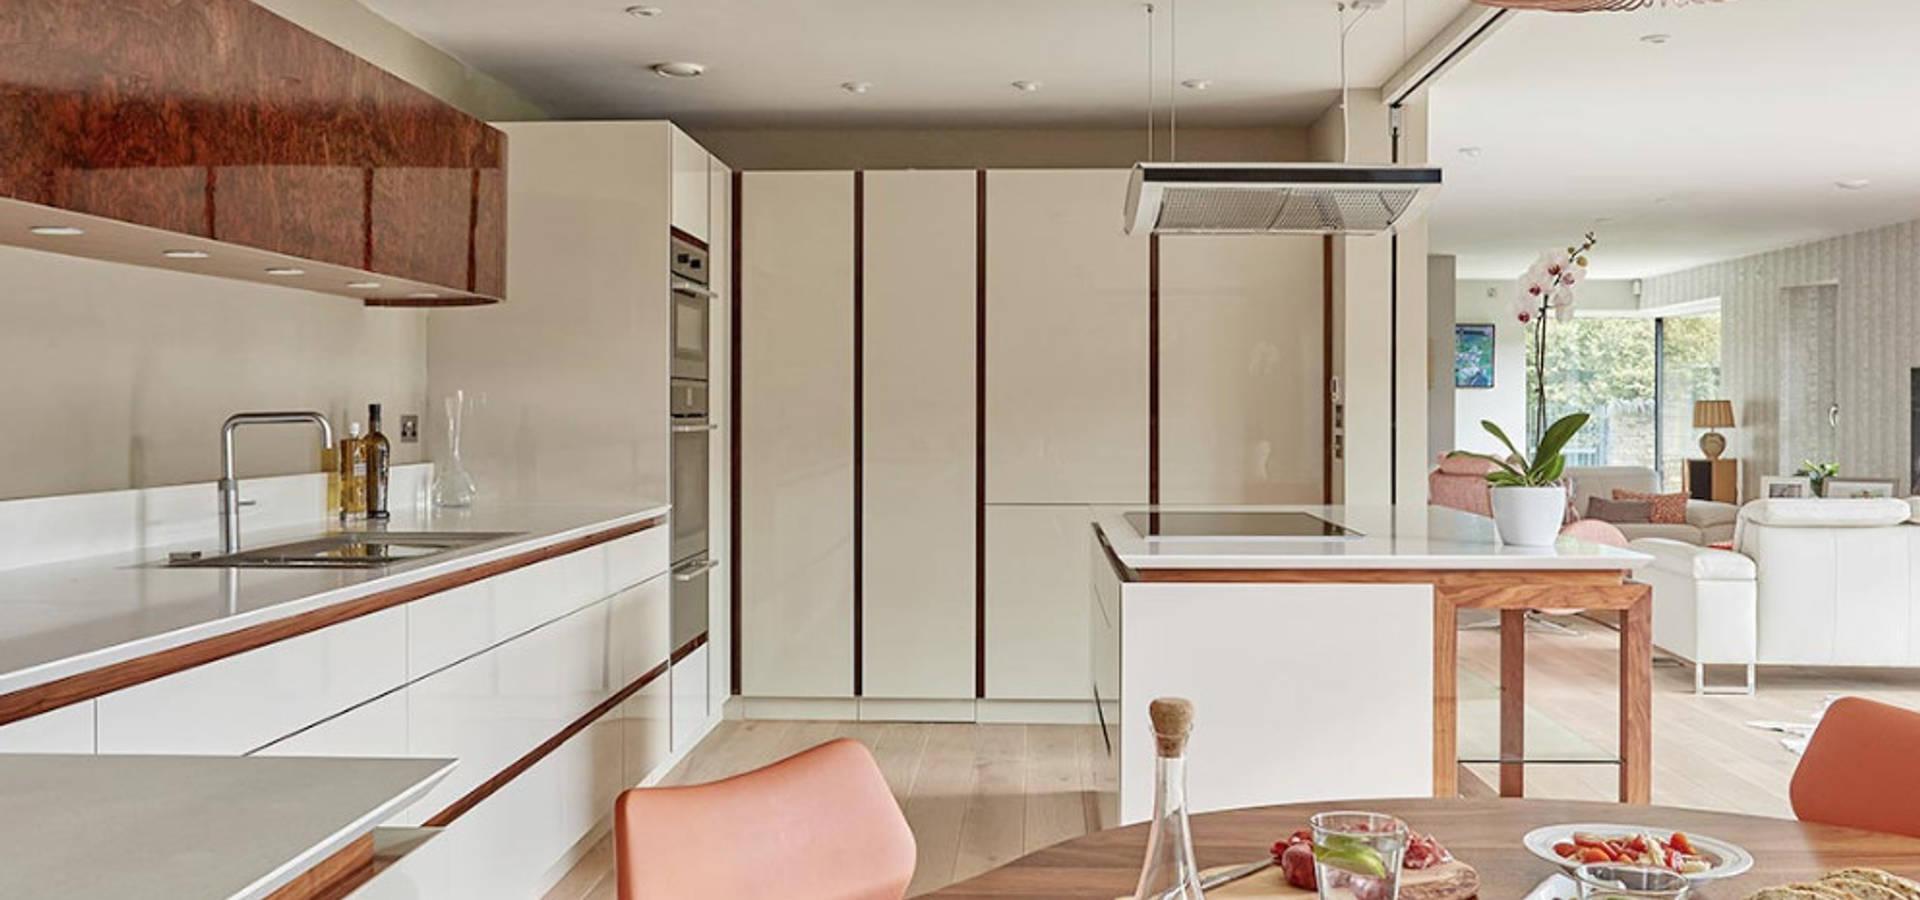 Stonehouse Handmade Bespoke Kitchens